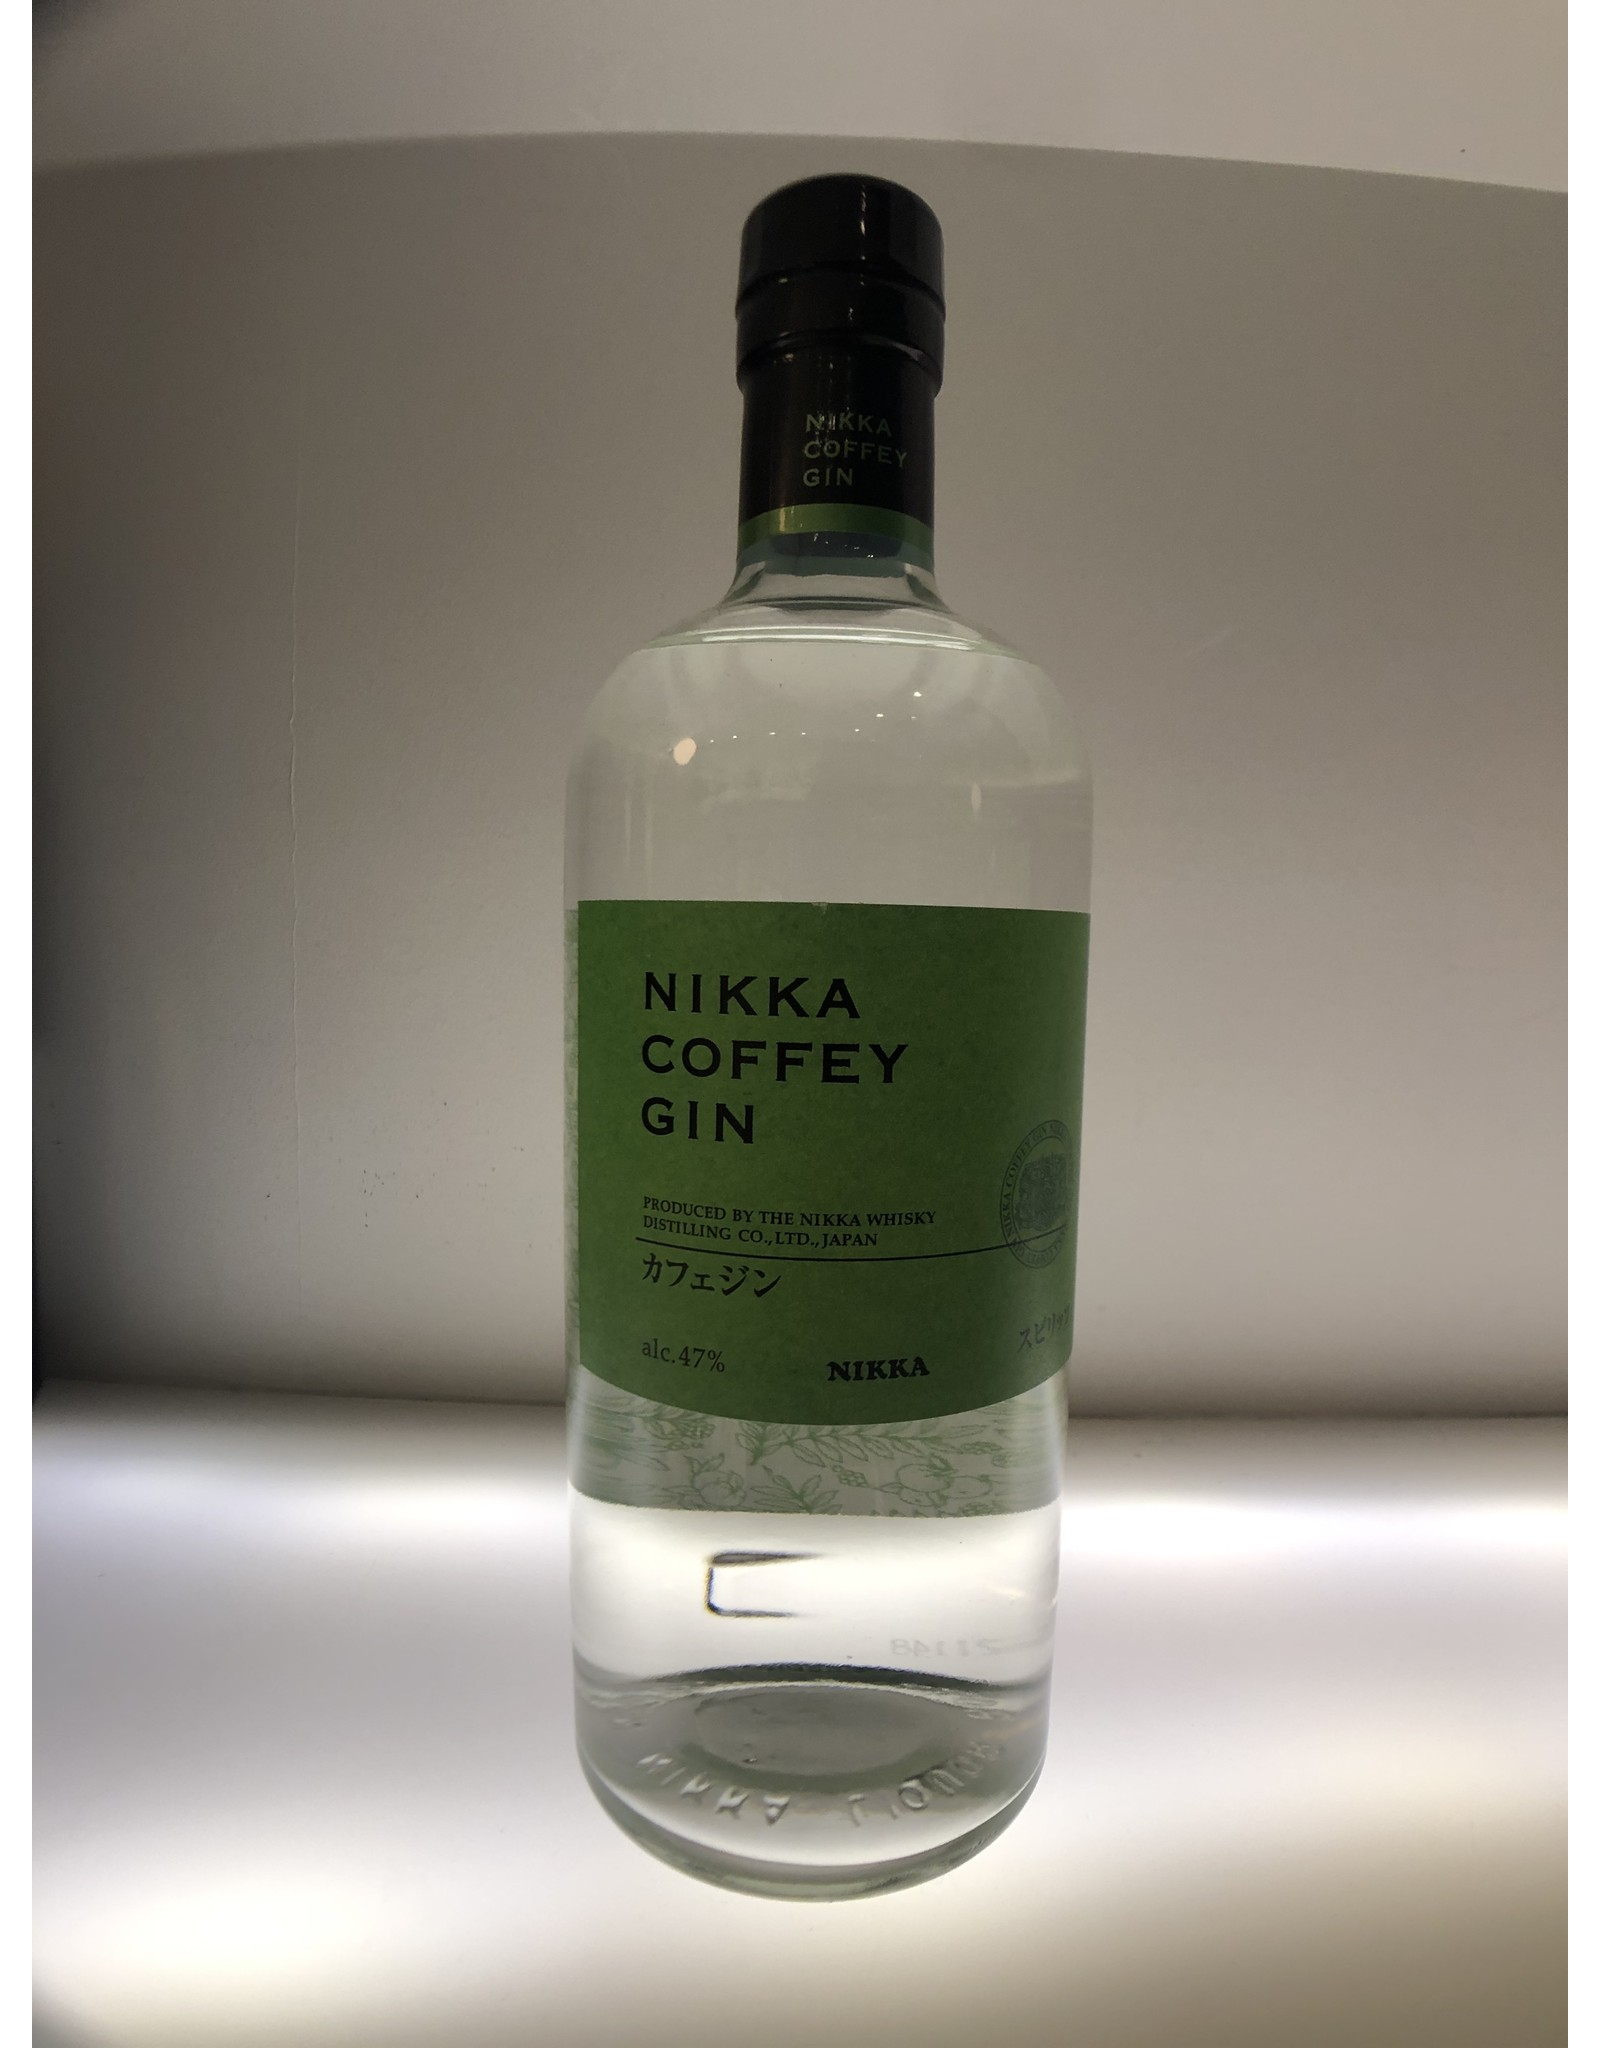 Nikka Nikka Coffey Gin, Japan (750mL)